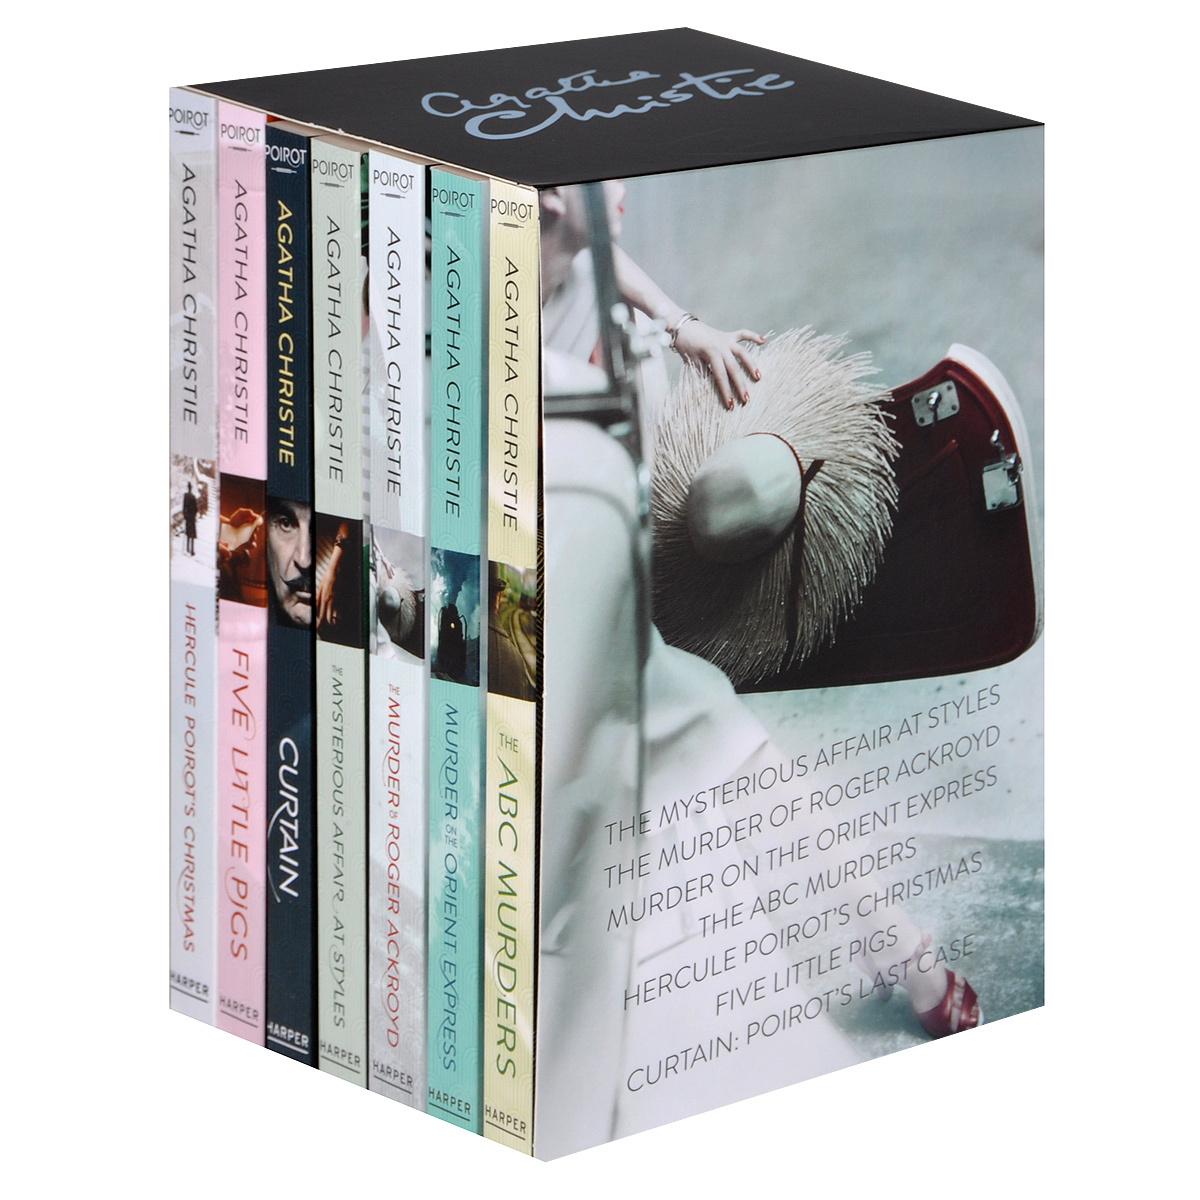 Hercule Poirot (комплект из 7 книг) | Кристи Агата #1